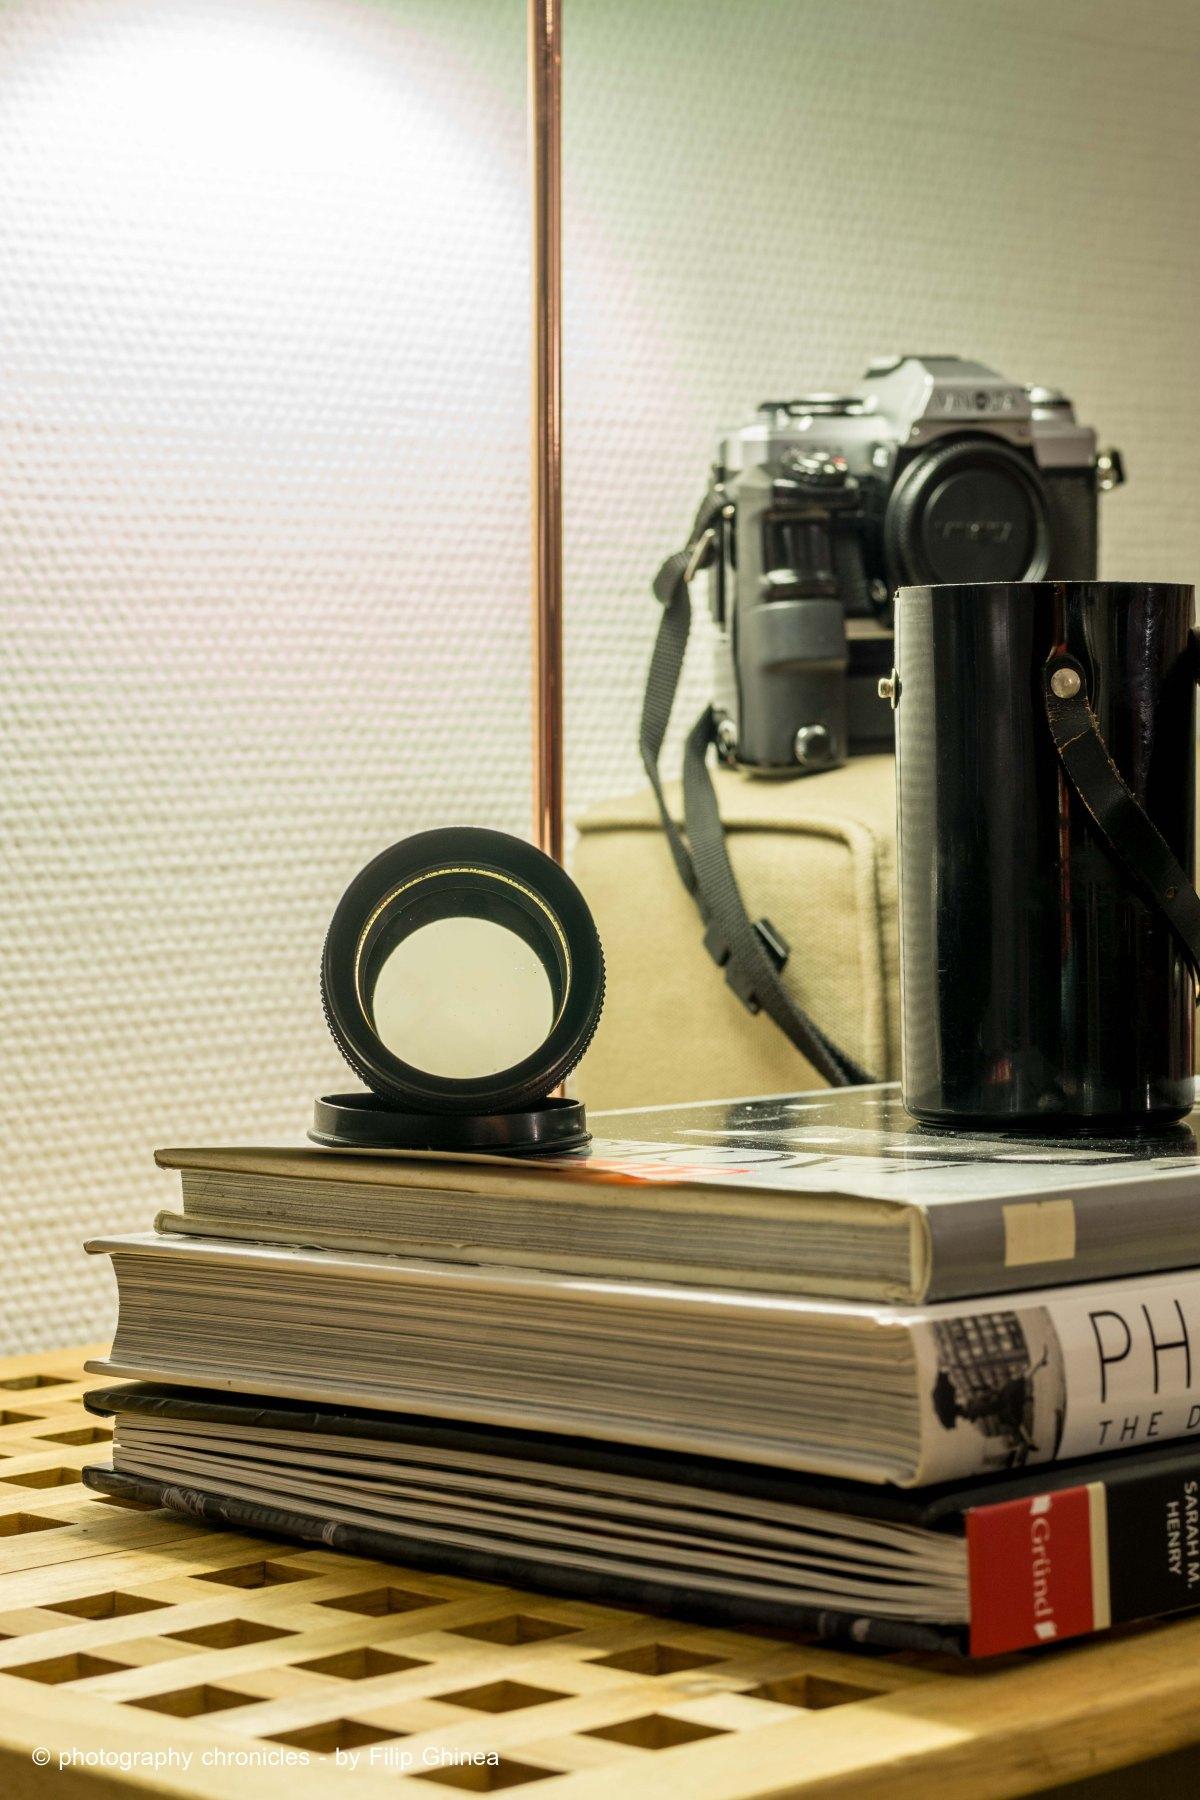 Pentacon 135mm f/2.8